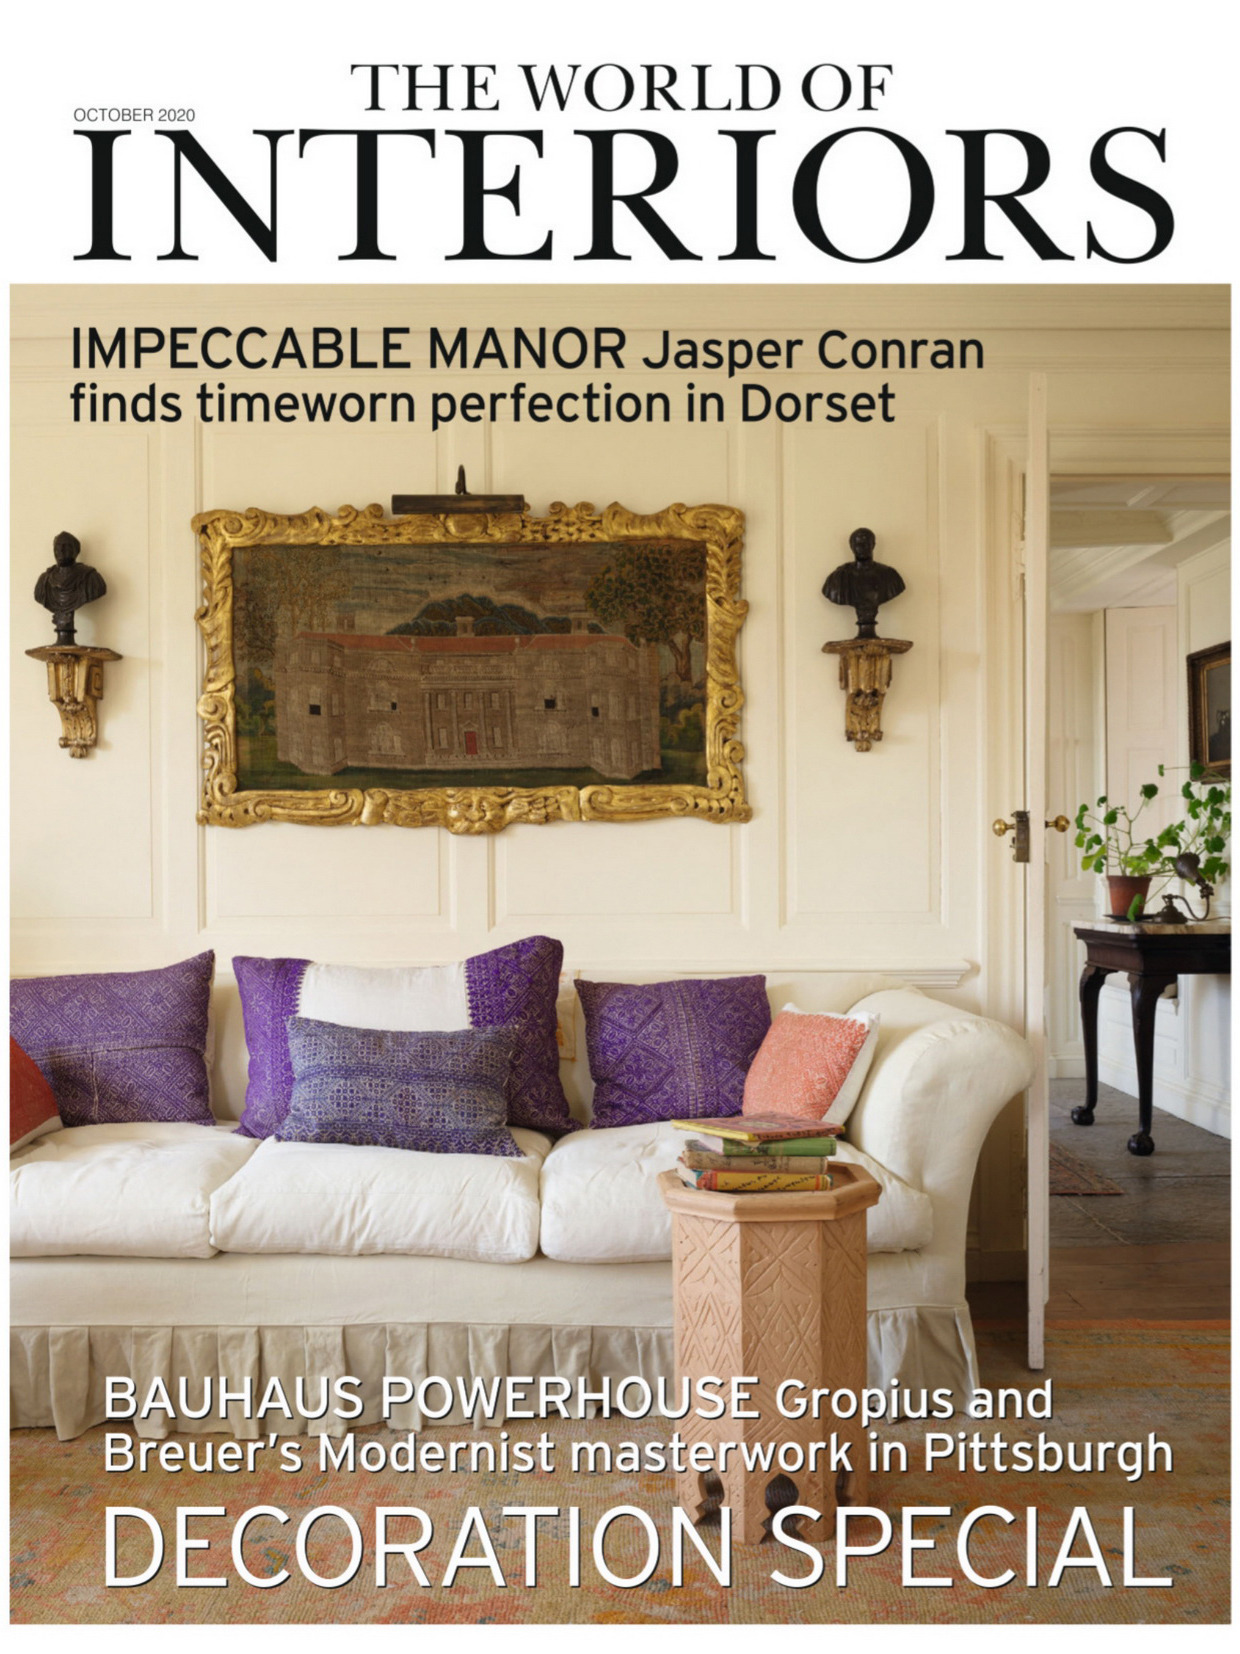 《THE WORLD OF INTERIORS》英国版时尚家居杂志2020年10月号